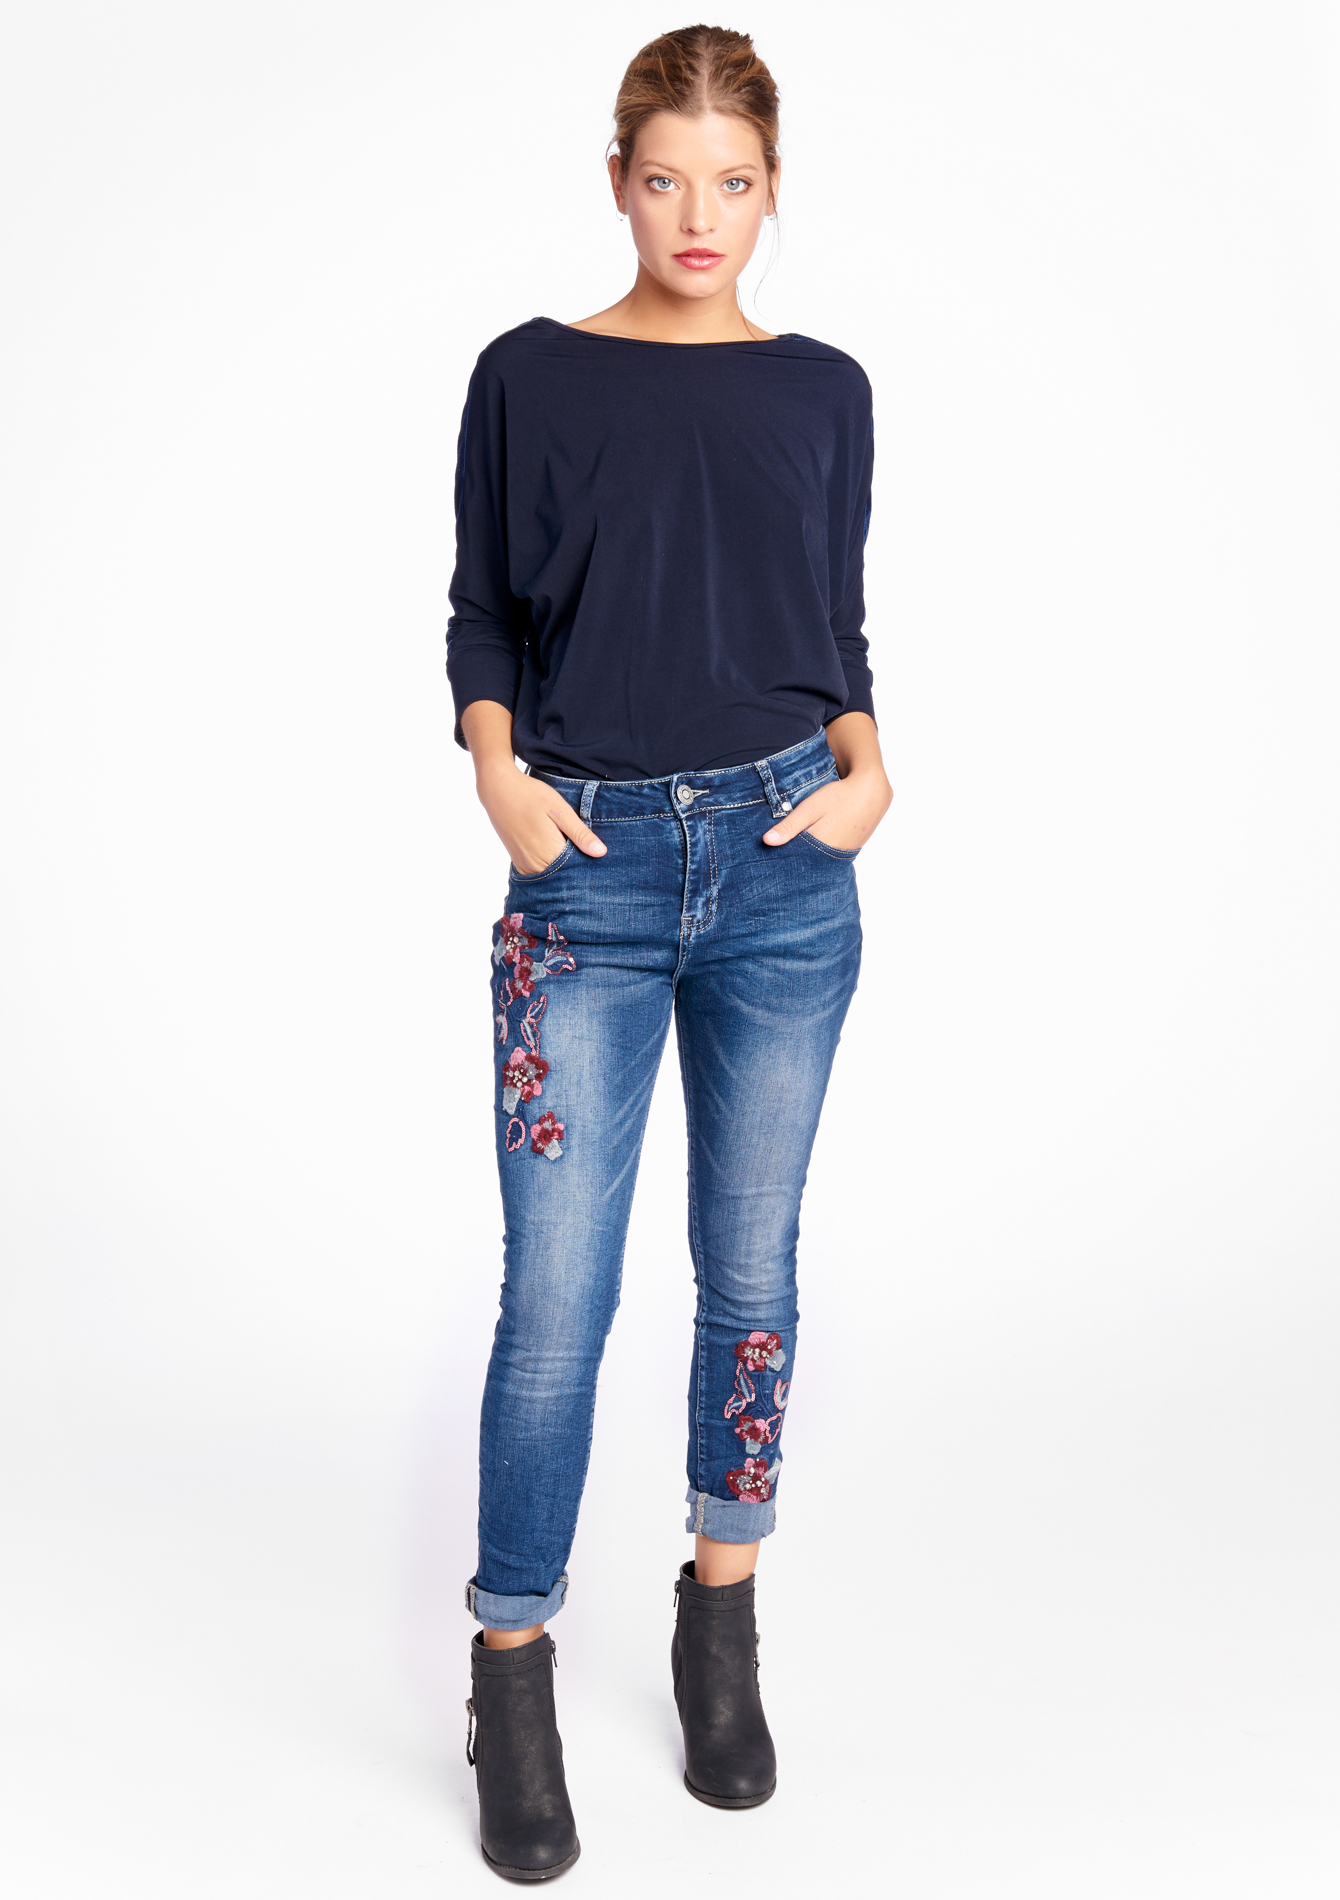 jeans avec broderie lolaliza. Black Bedroom Furniture Sets. Home Design Ideas